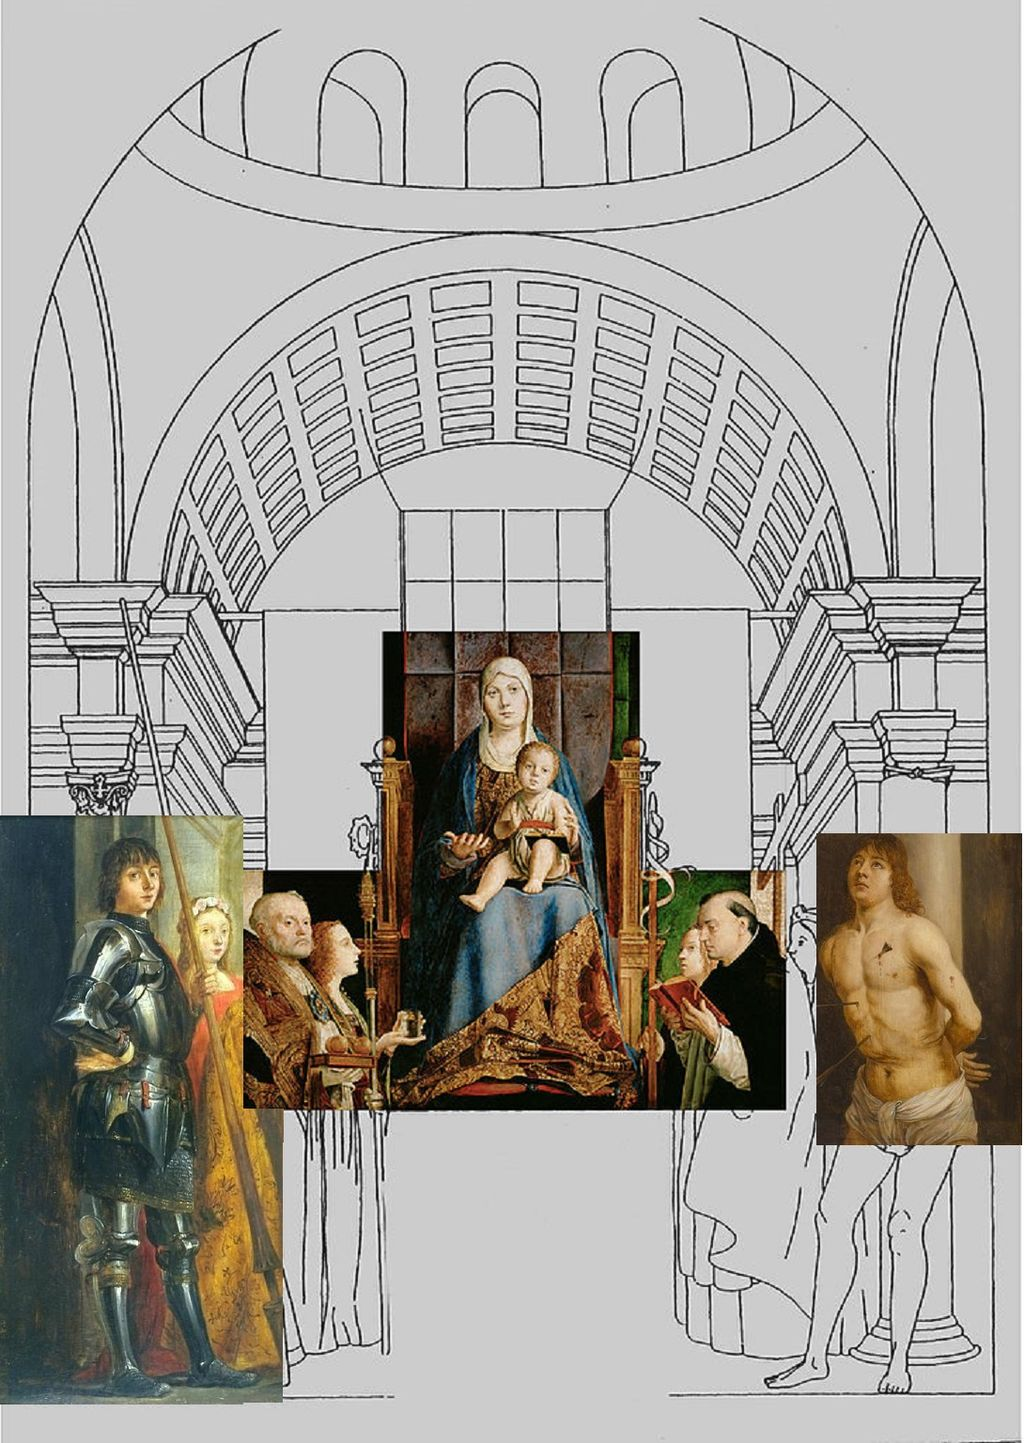 Pala di San Cassiano-Messina reconstruction